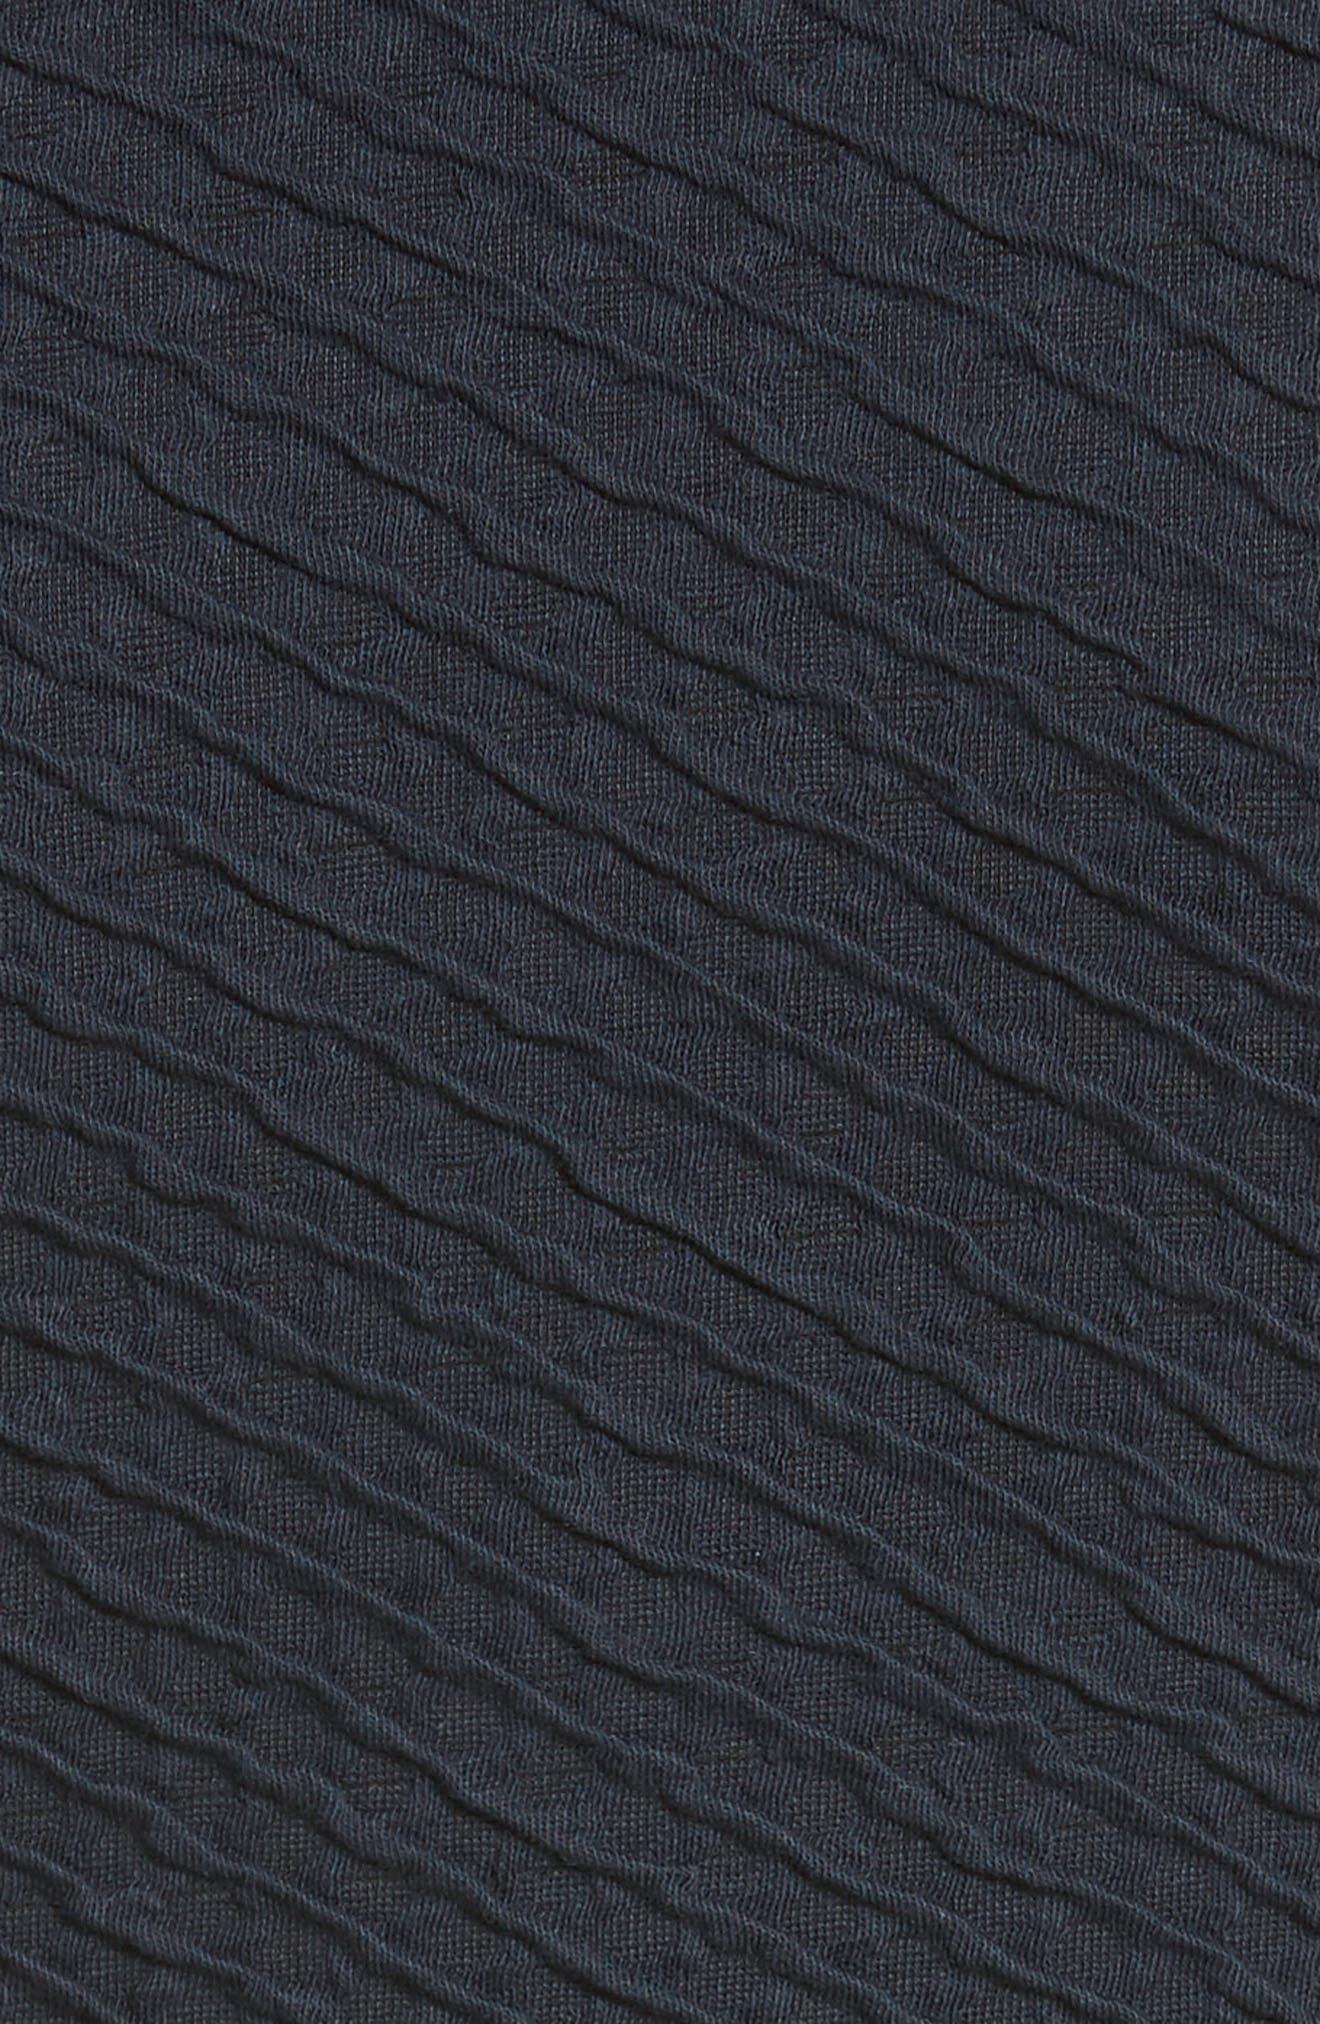 Diagonal Jacquard Peplum Jacket,                             Alternate thumbnail 3, color,                             Navy